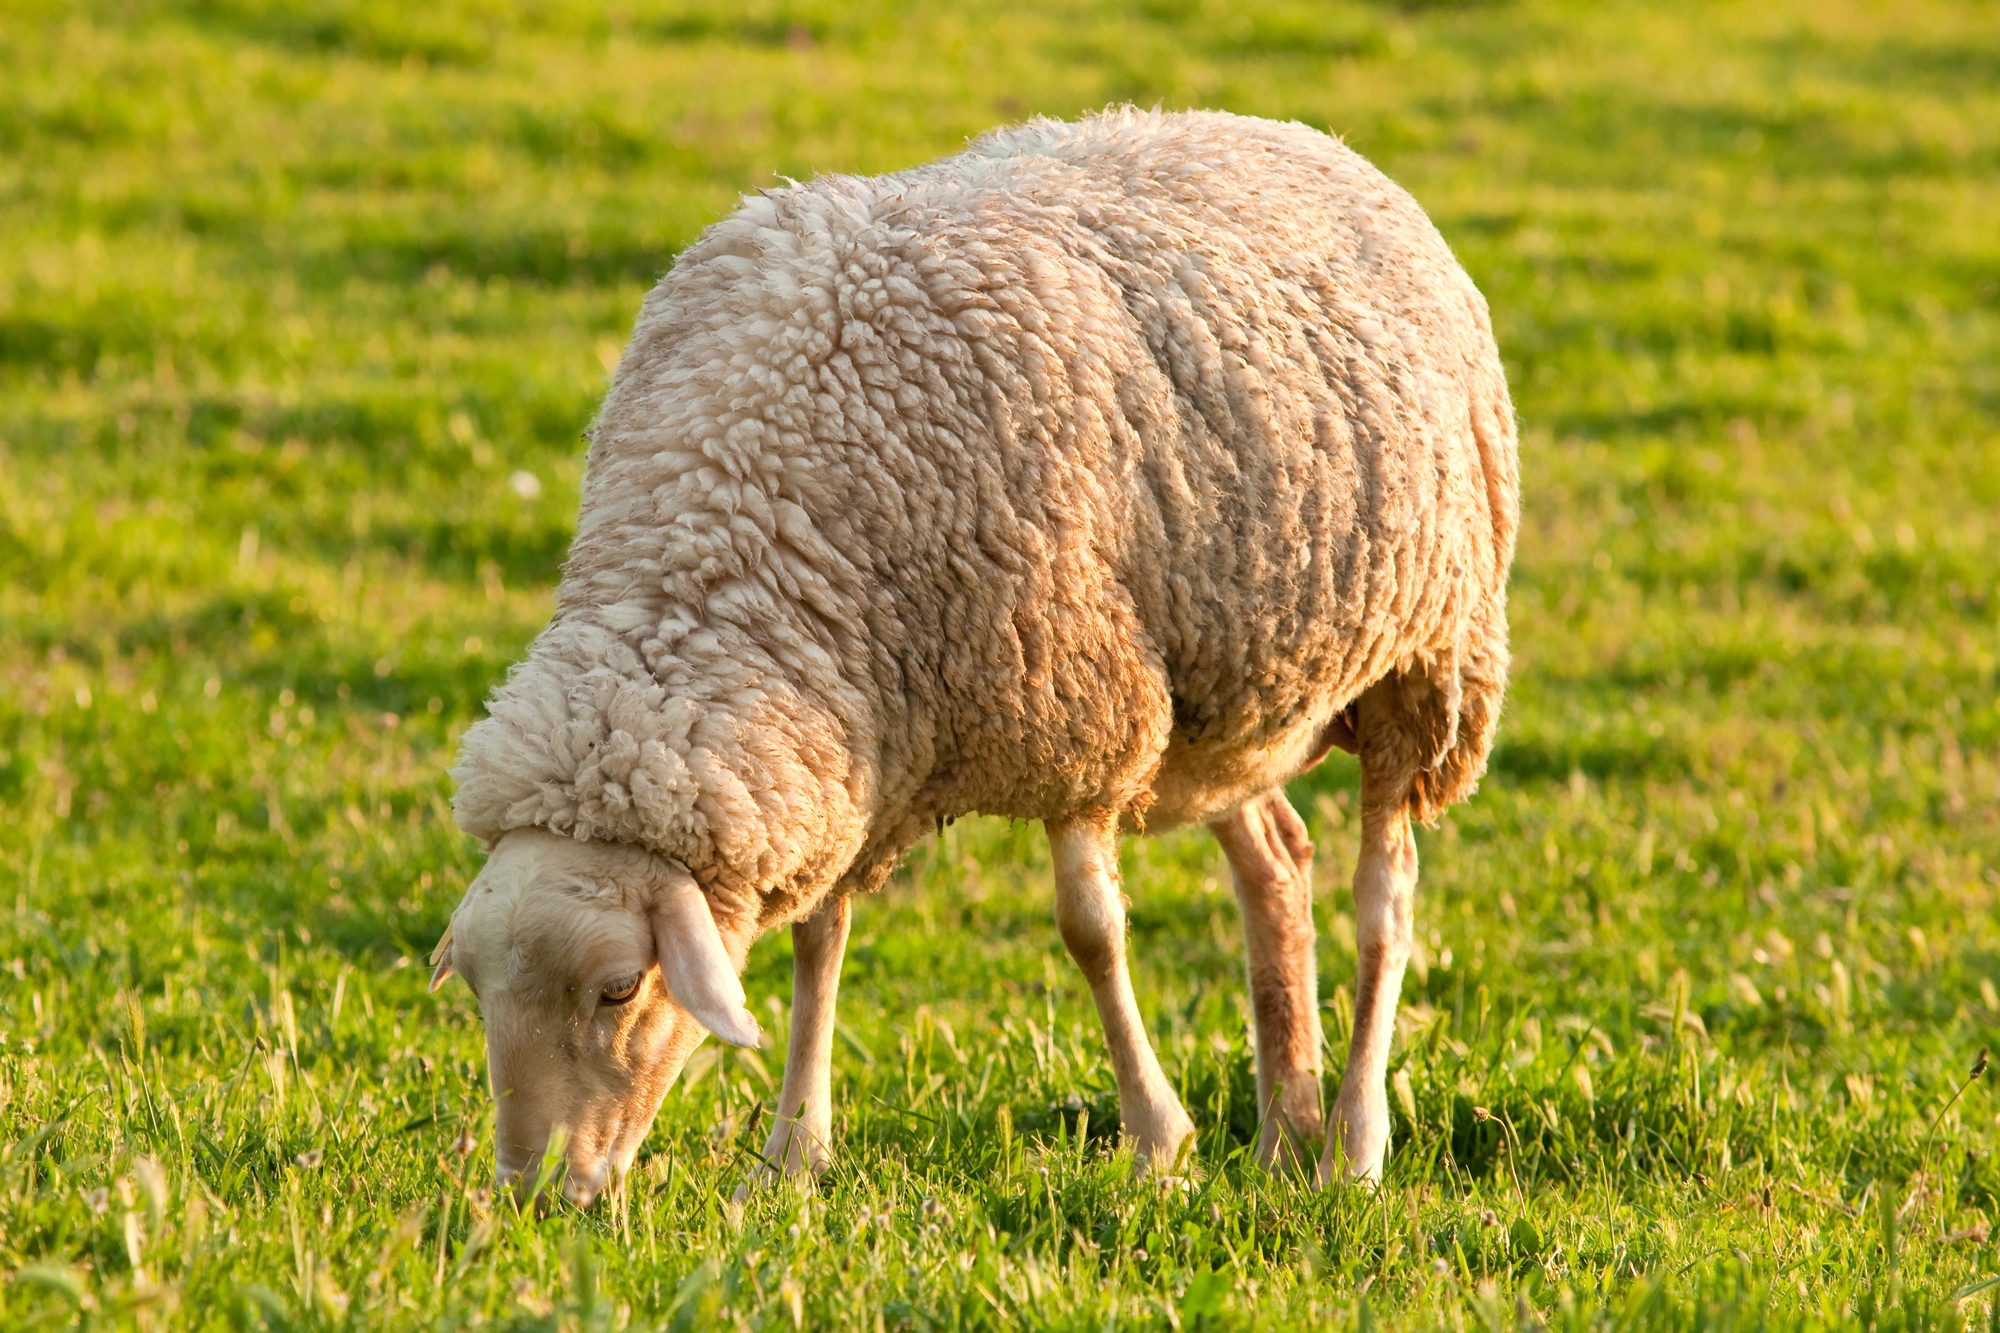 5 Ways to Keep Your Farm Animals Healthy With Feed Supplements for Livestock - Vittetoe. Inc. - Seventy-Six   NearSay